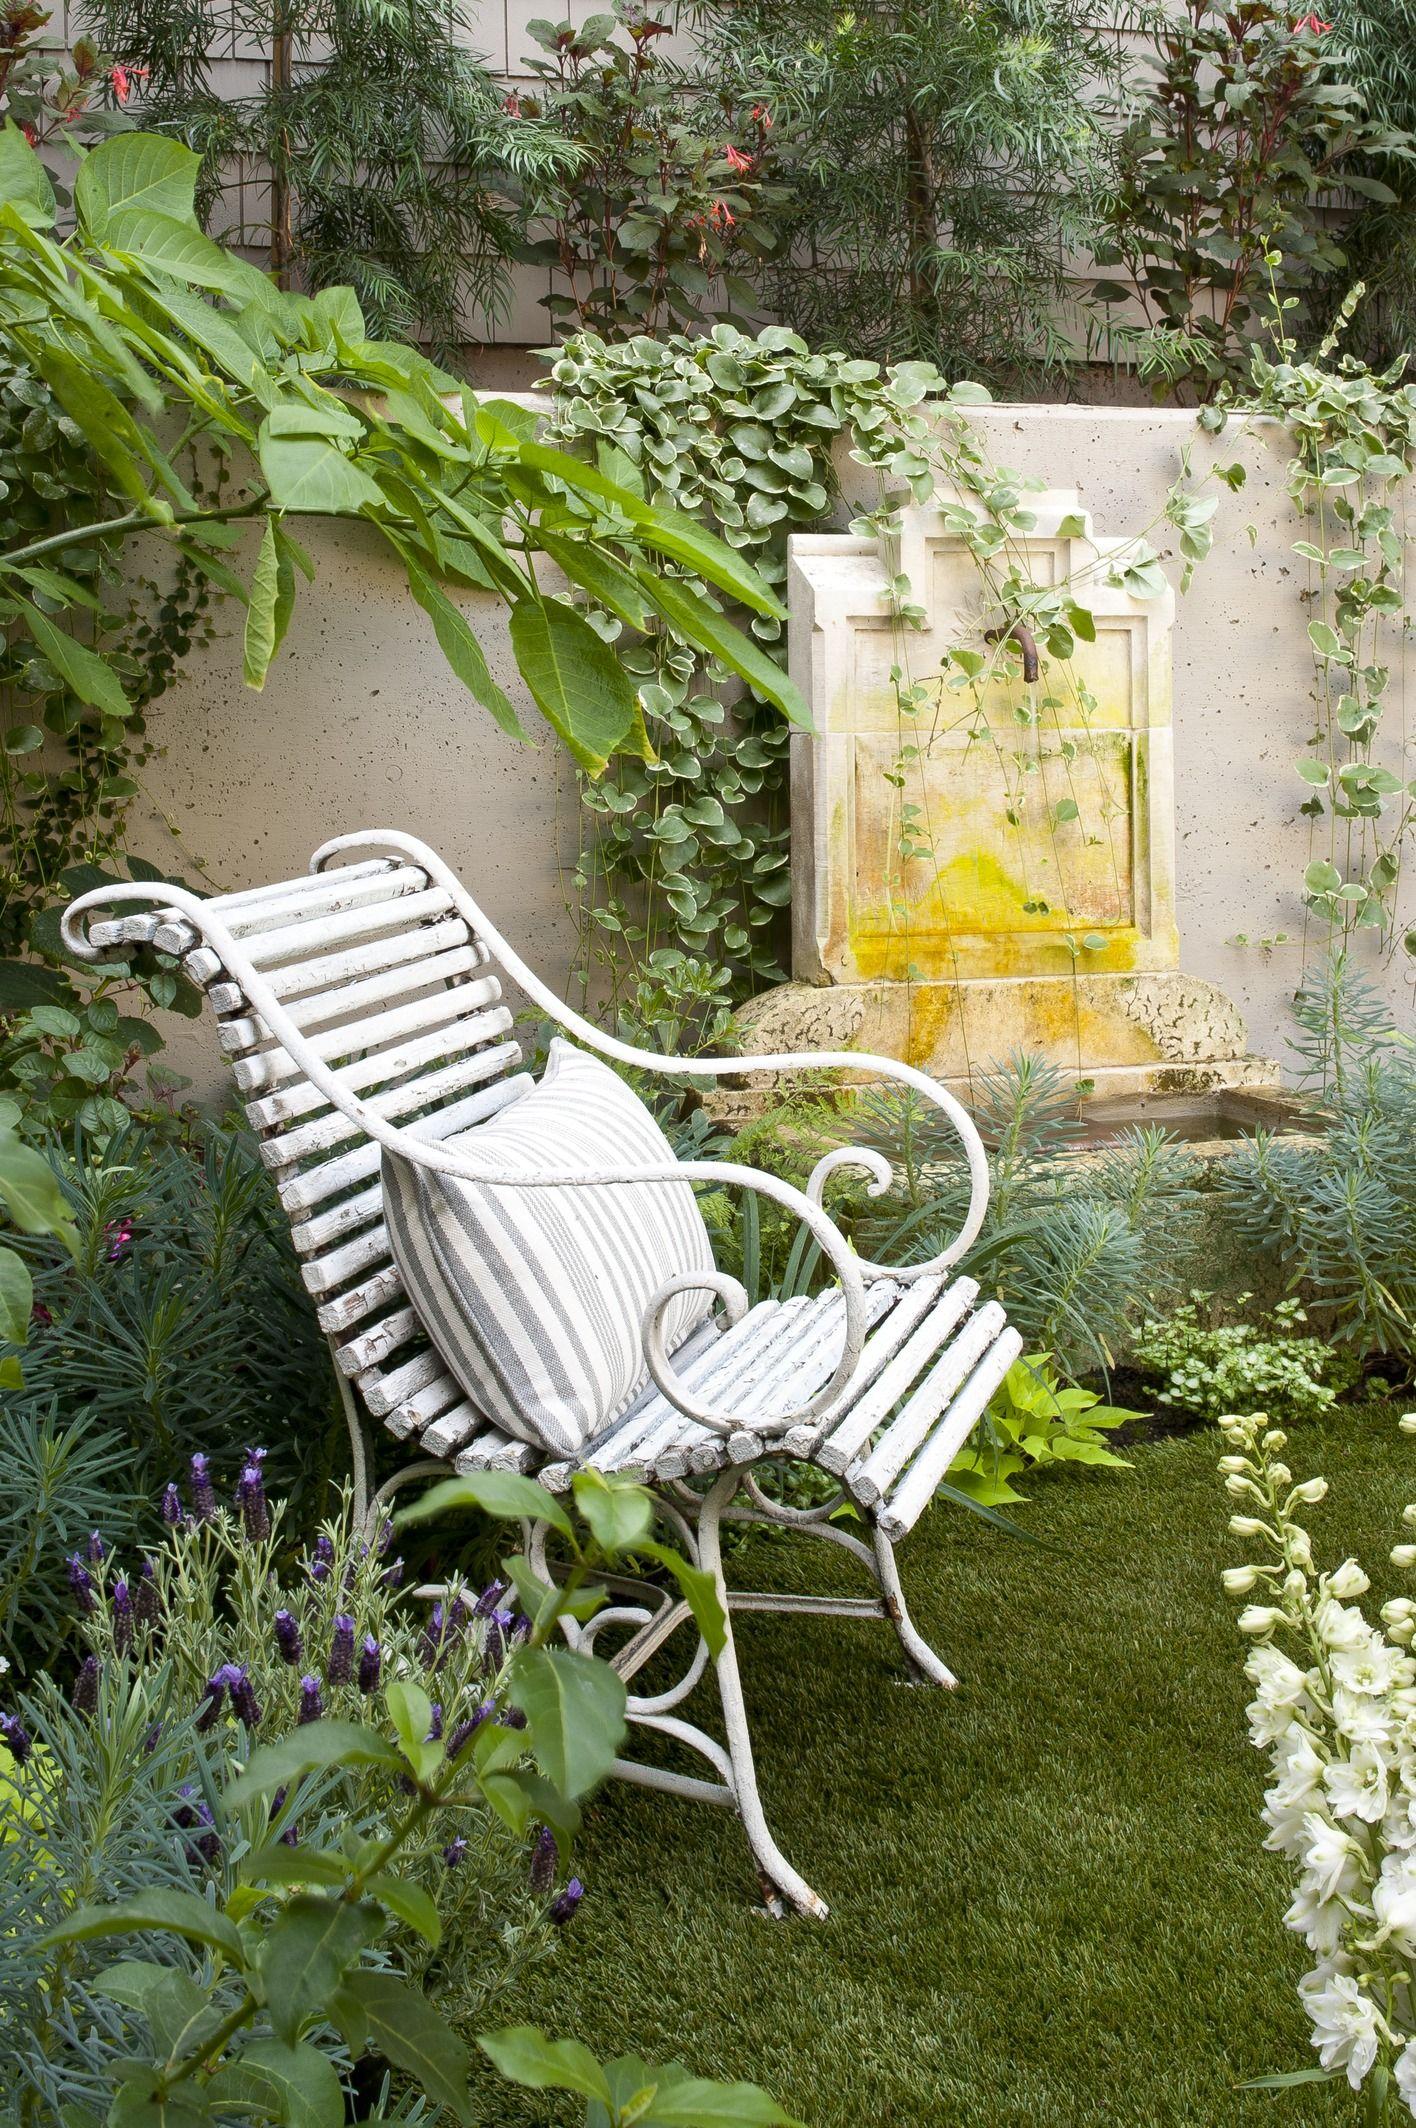 French Flair In A San Francisco Townhome Courtyard Gardens Design Garden Sitting Areas Traditional Garden